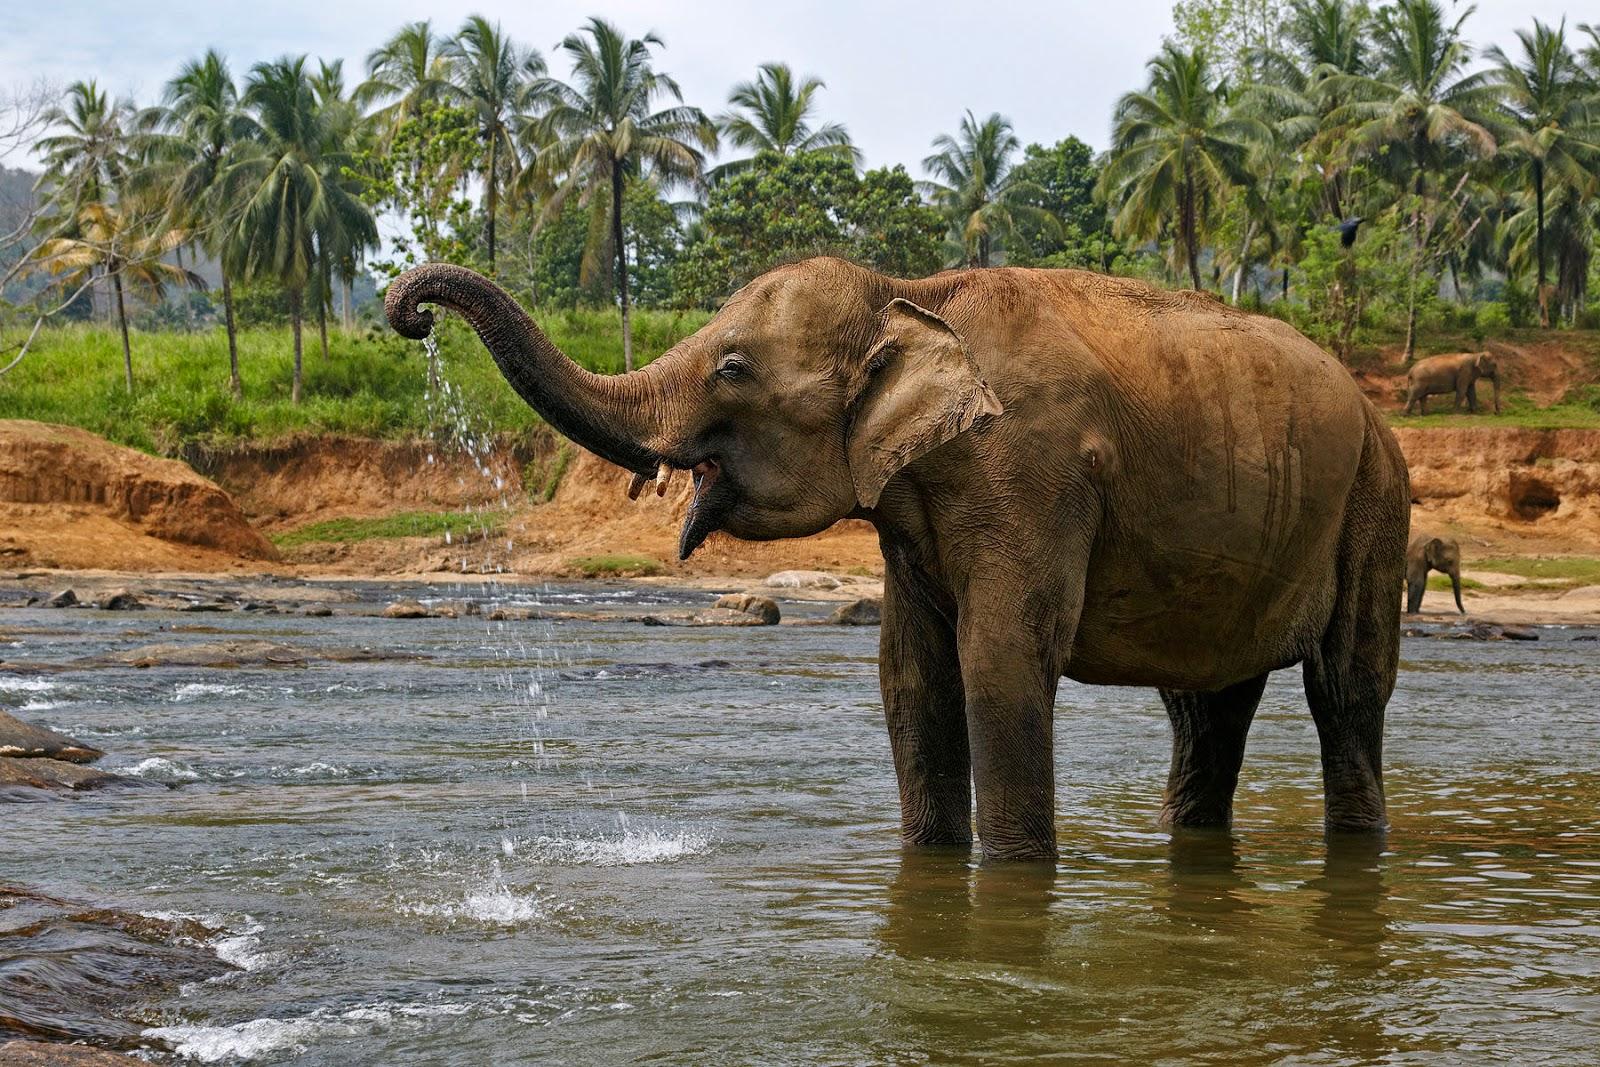 Wallpaper download elephant - Elephant Best Hd Wallpapers